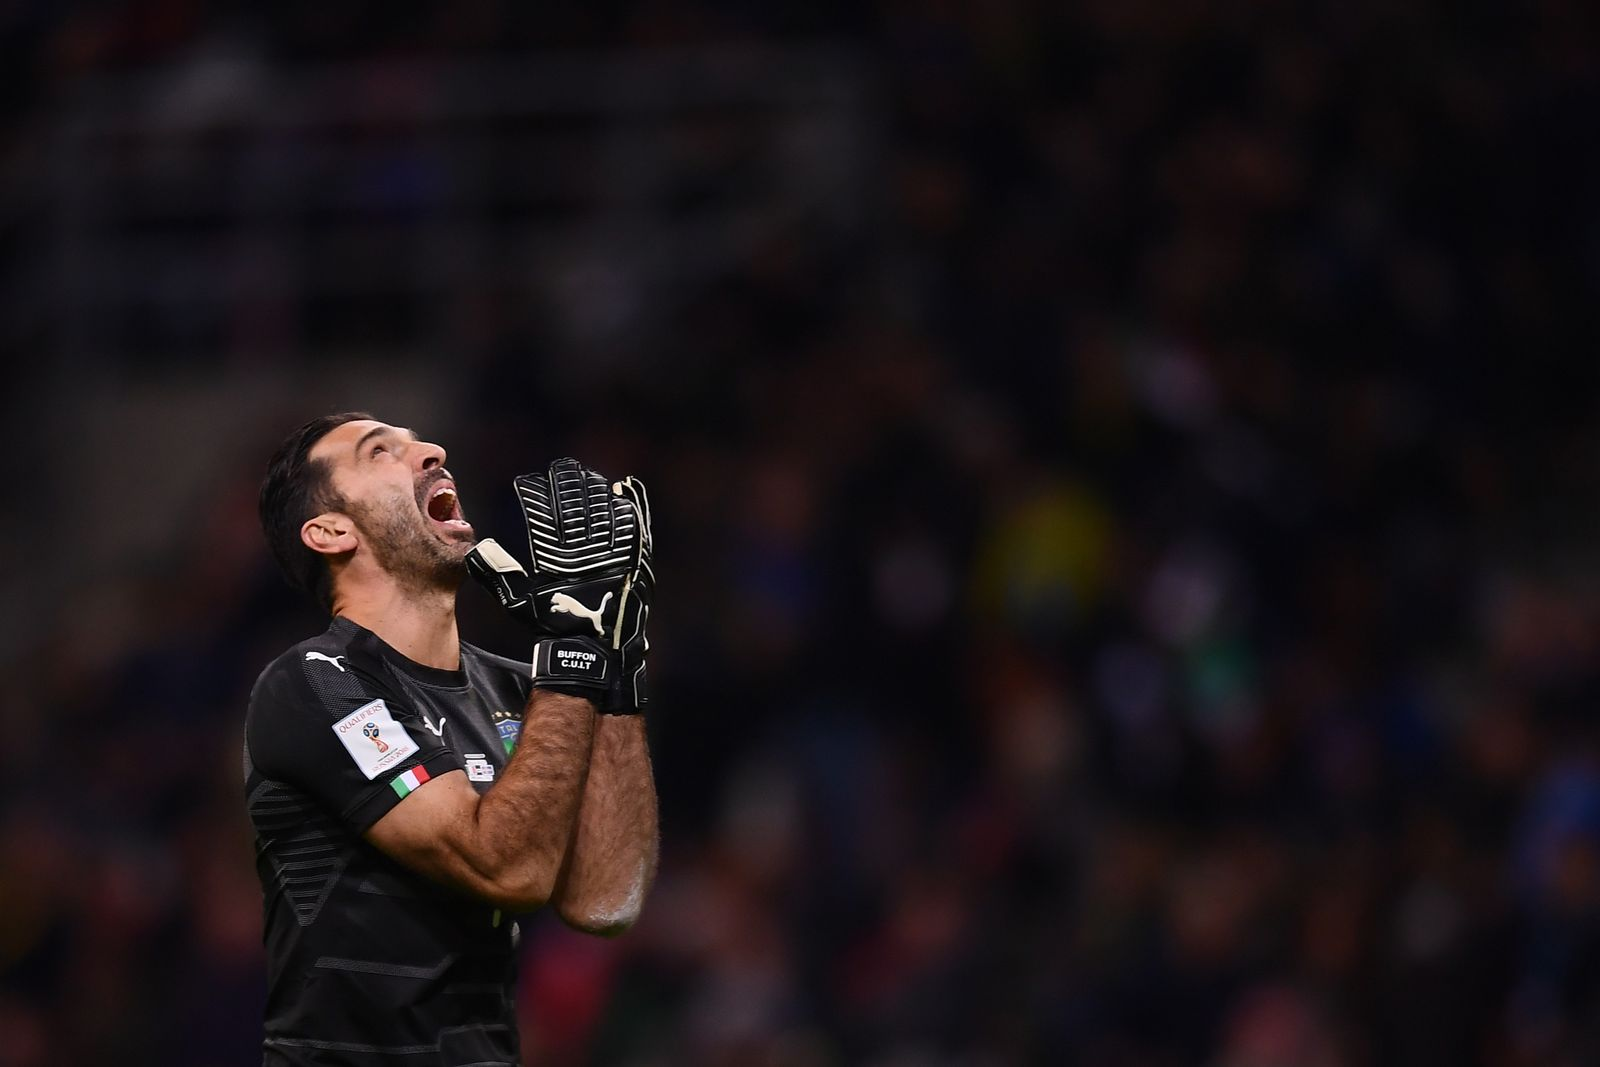 Gianluigi Buffon/ FIFA 2018 World Cup